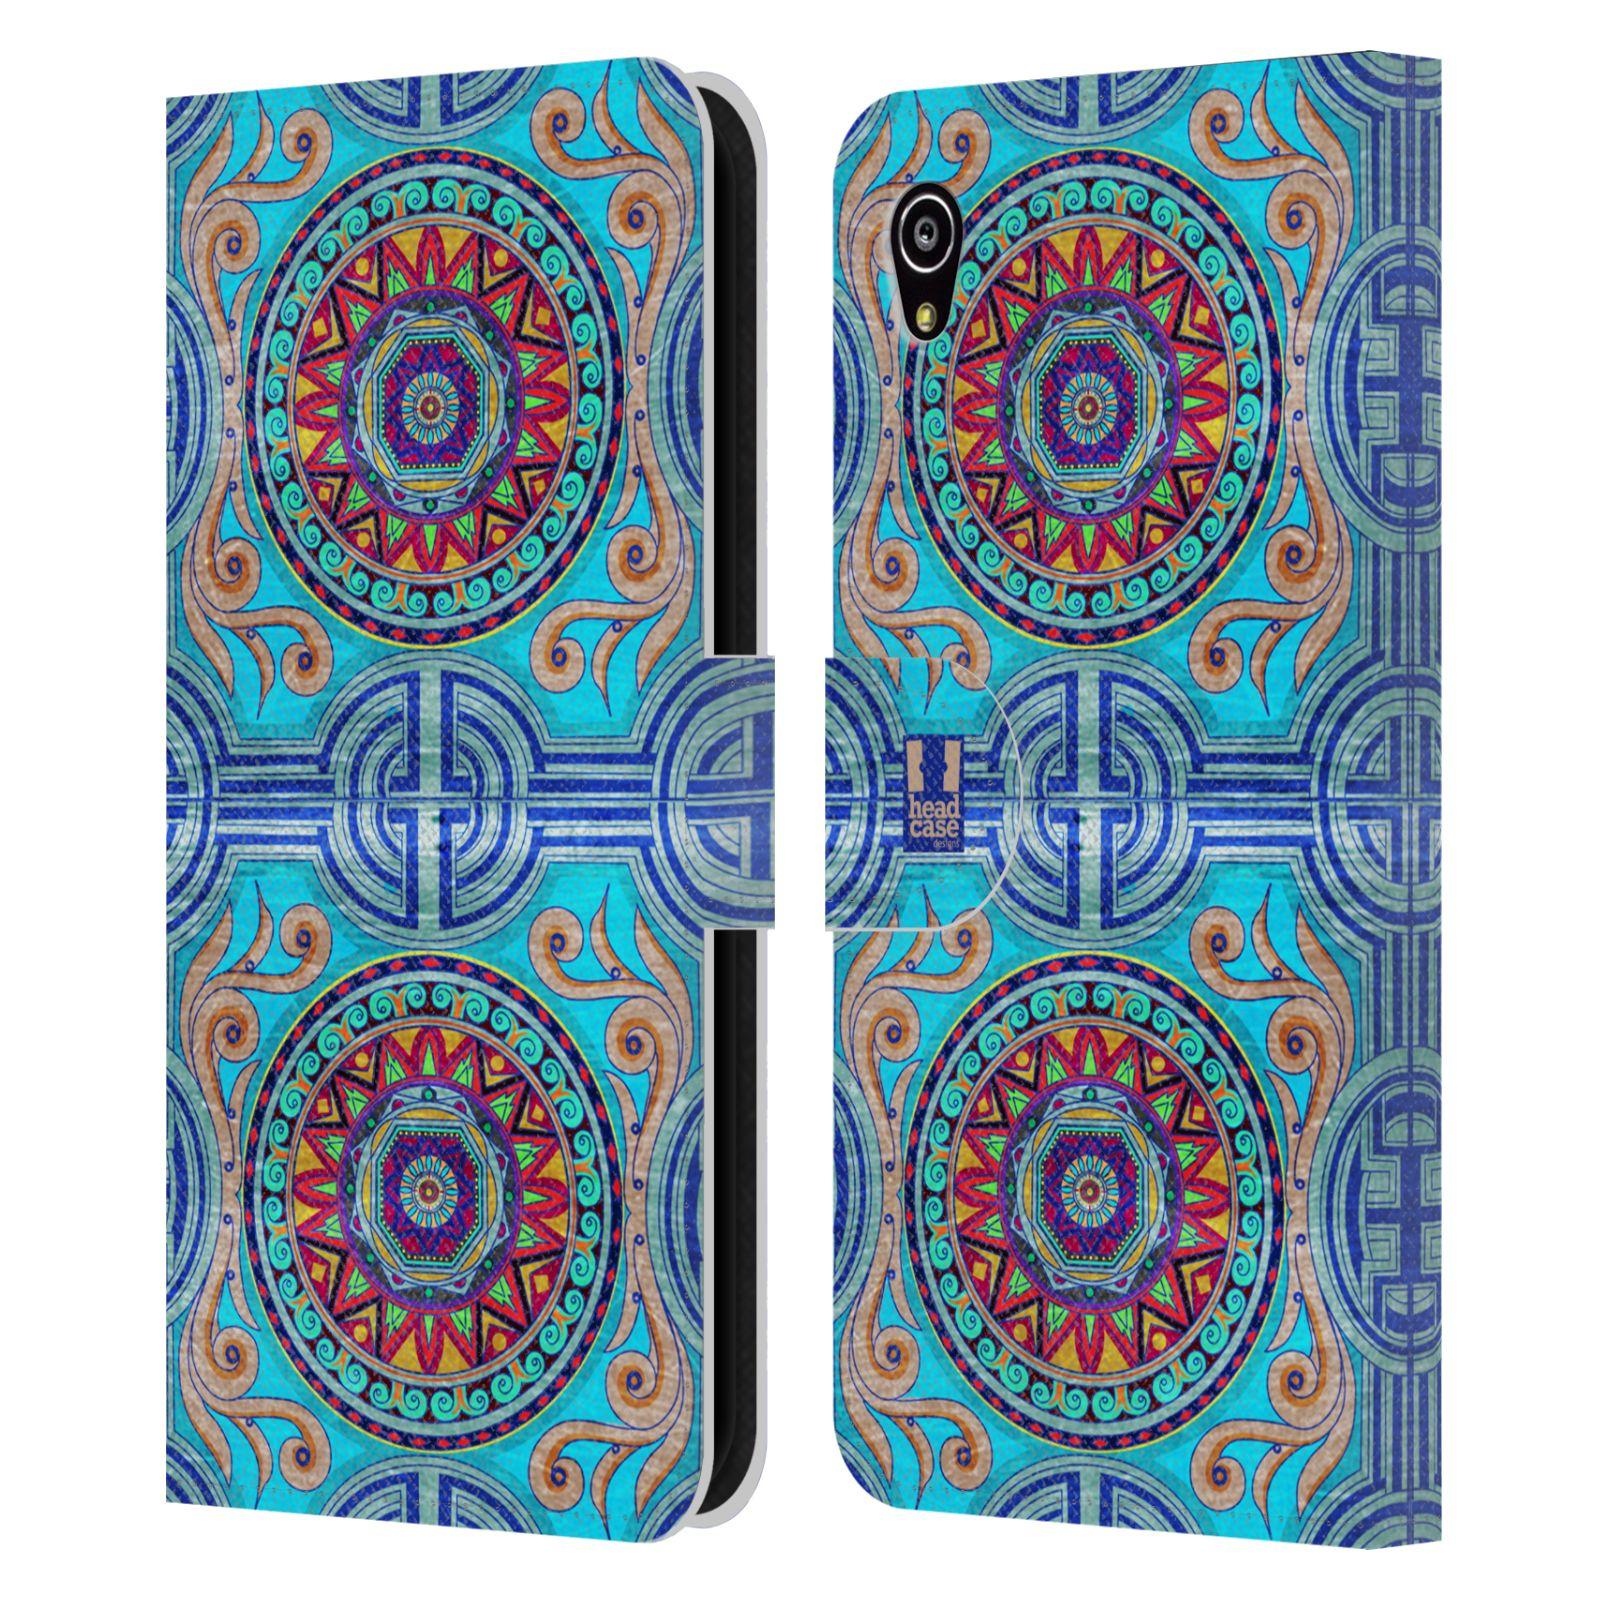 HEAD CASE Flipové pouzdro pro mobil SONY XPERIA M4 AQUA ARABESKA modrá